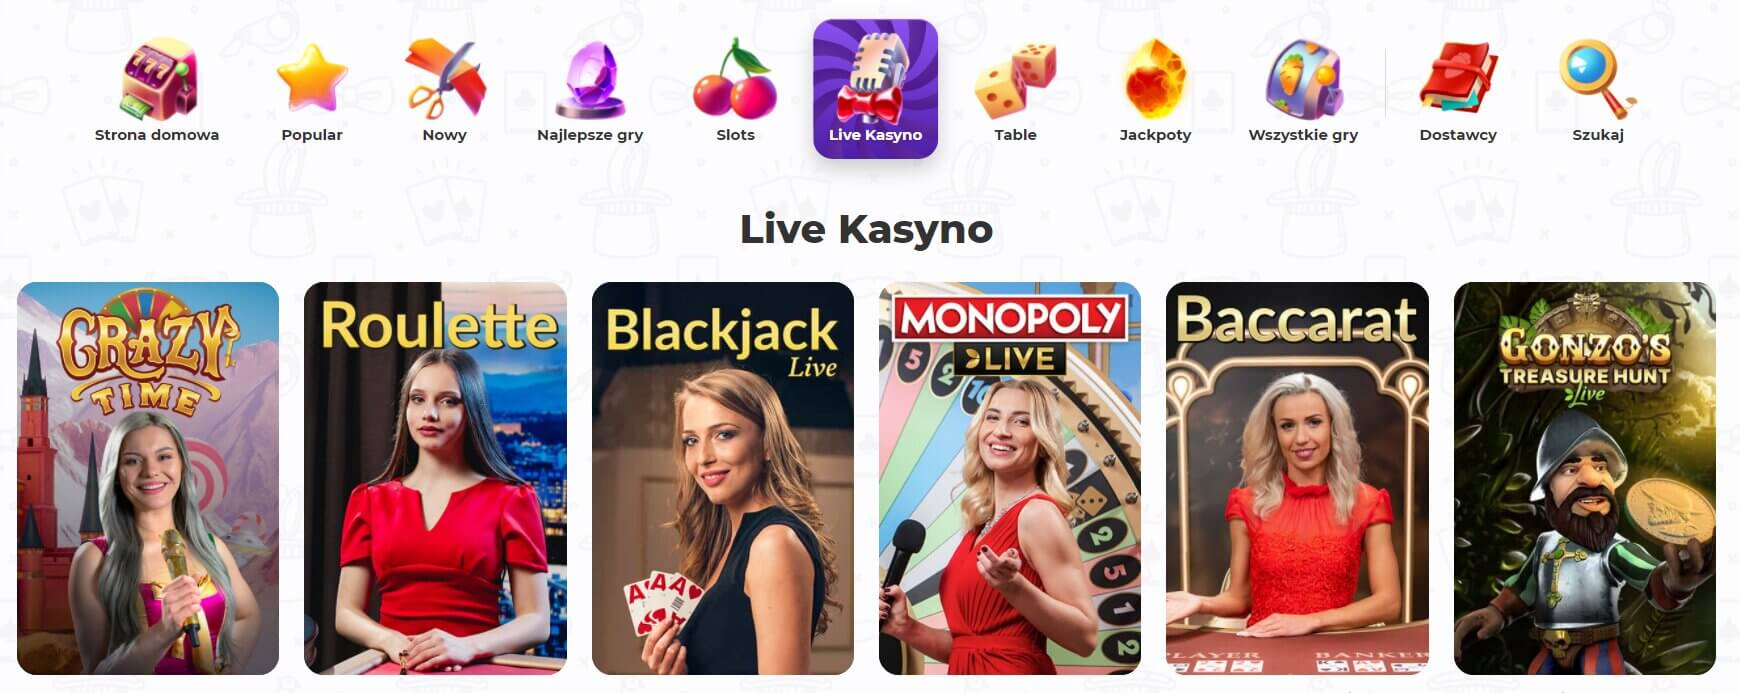 cadabrus live casino screenshot